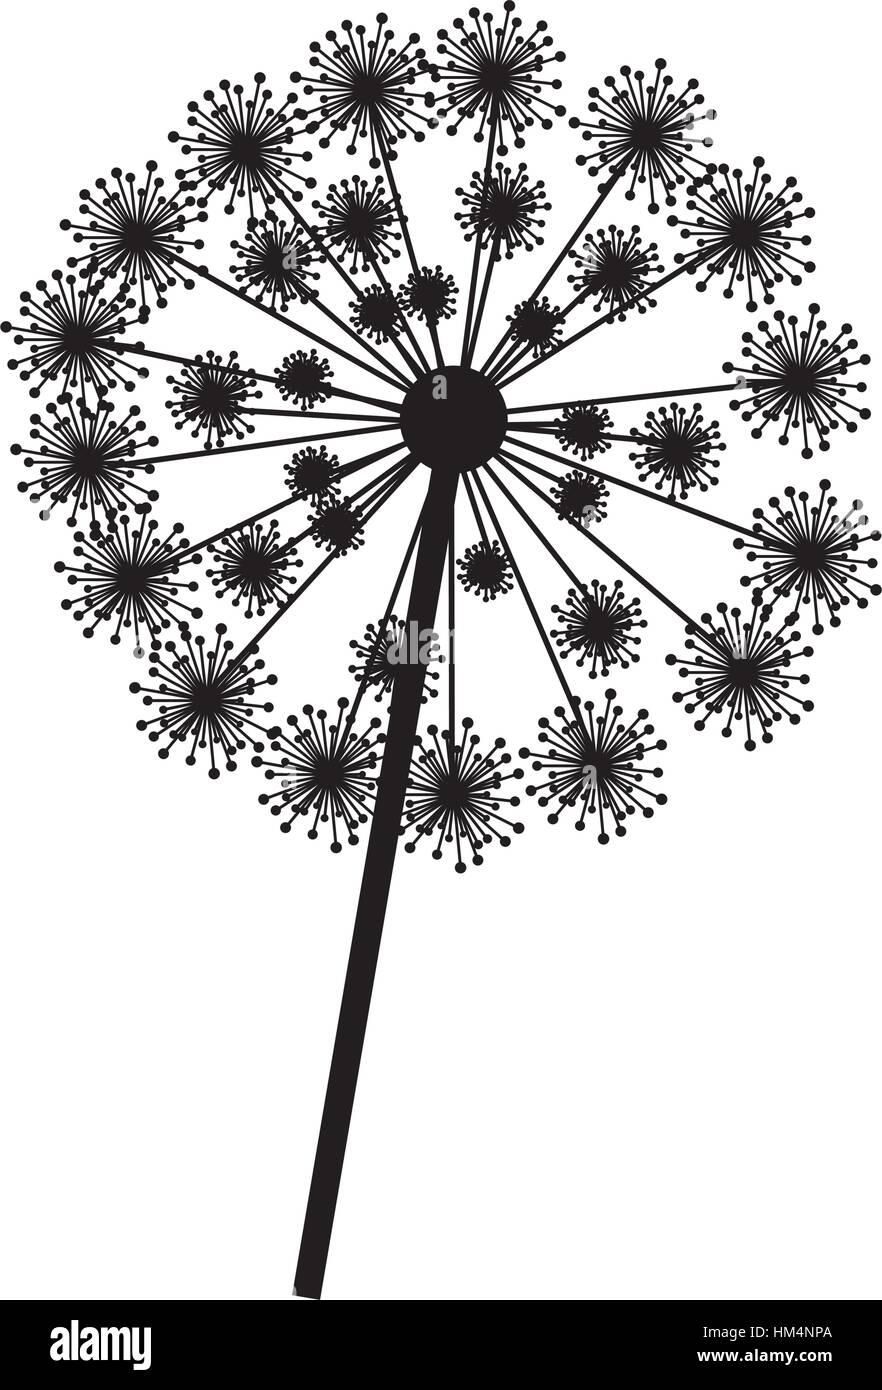 silhouette dandelion with stem and pistil closeup vector illustration Stock Vector